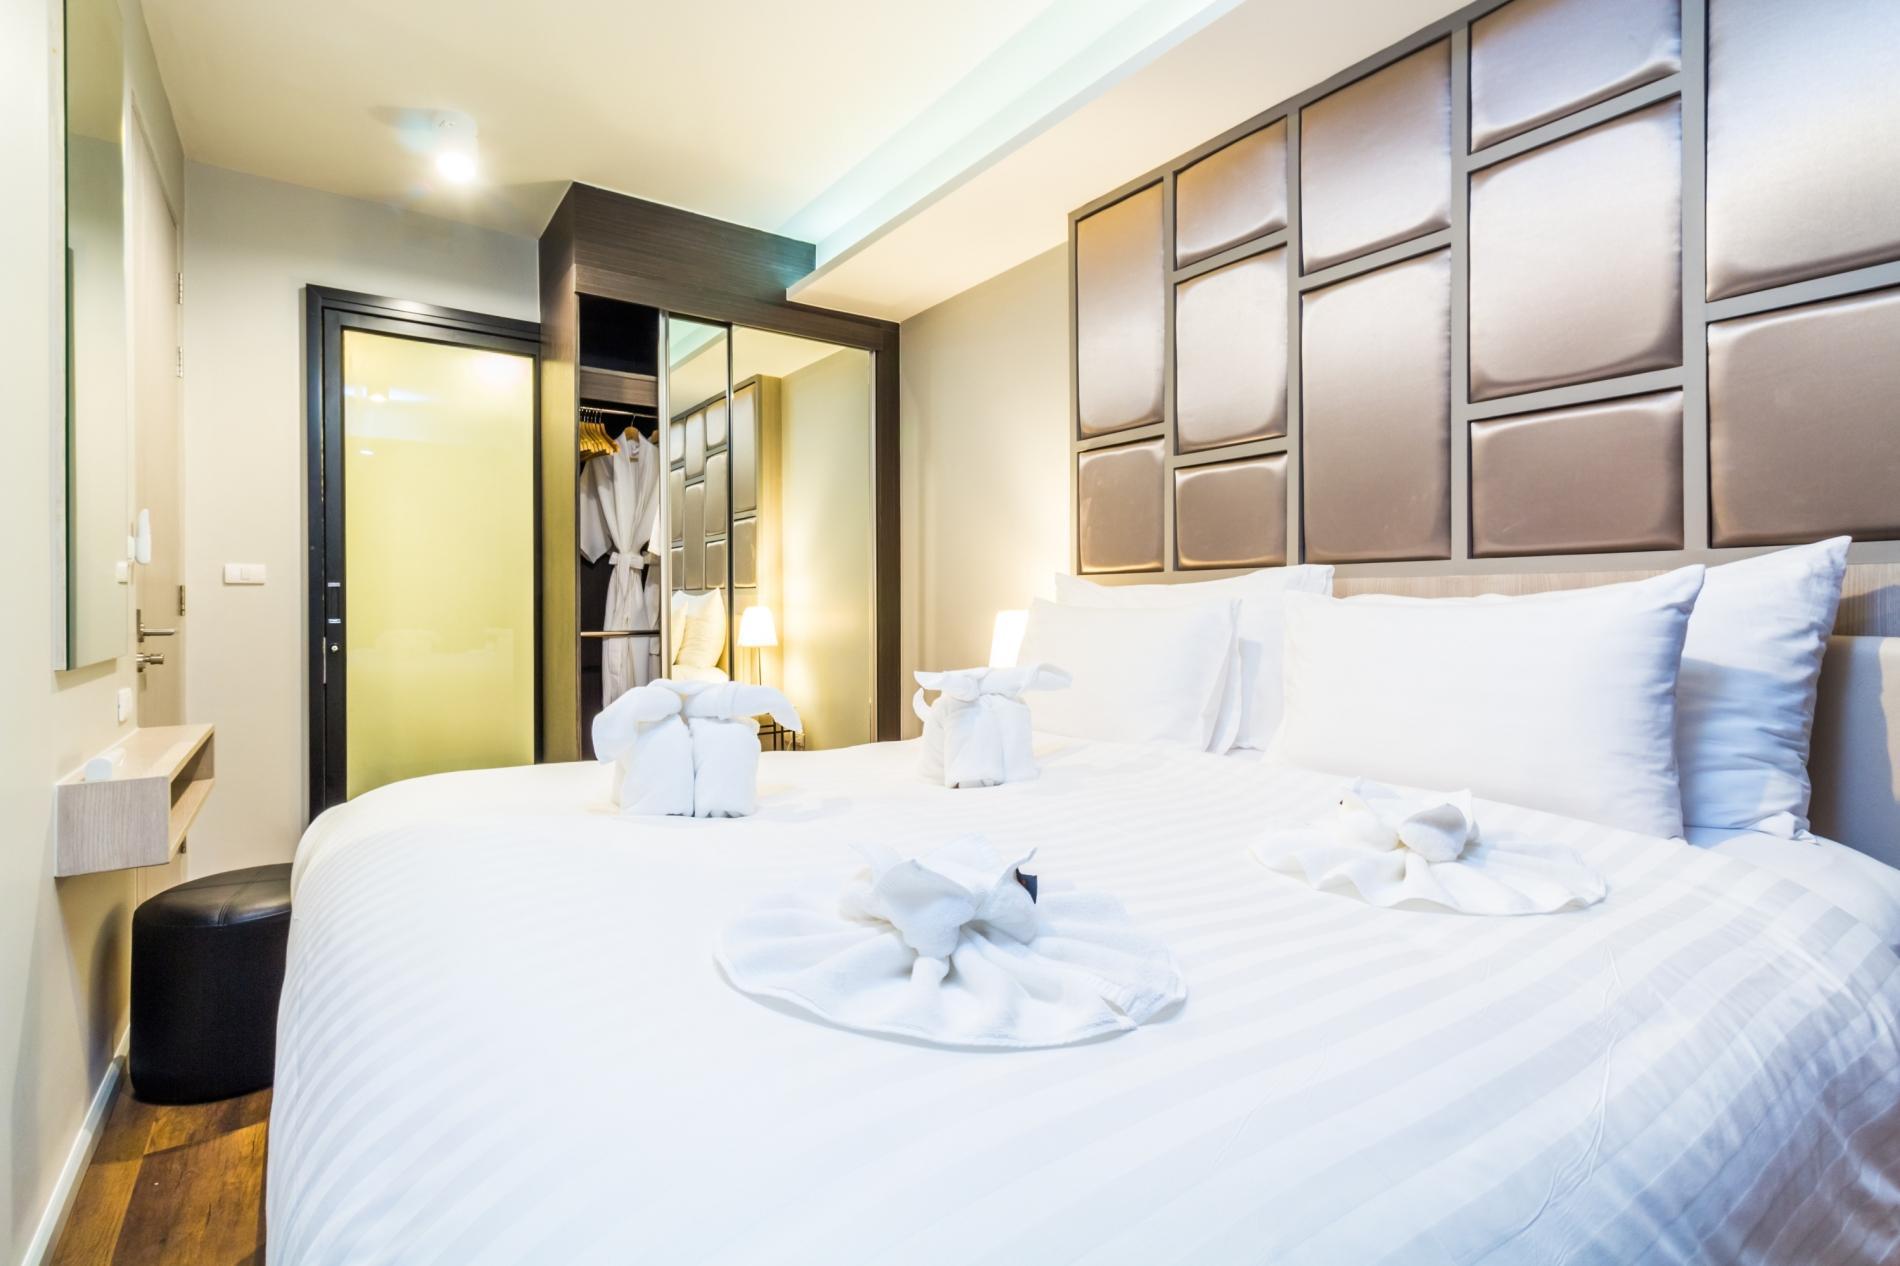 Apartment 6Av 703 - Large apartment in Surin beach photo 20319196